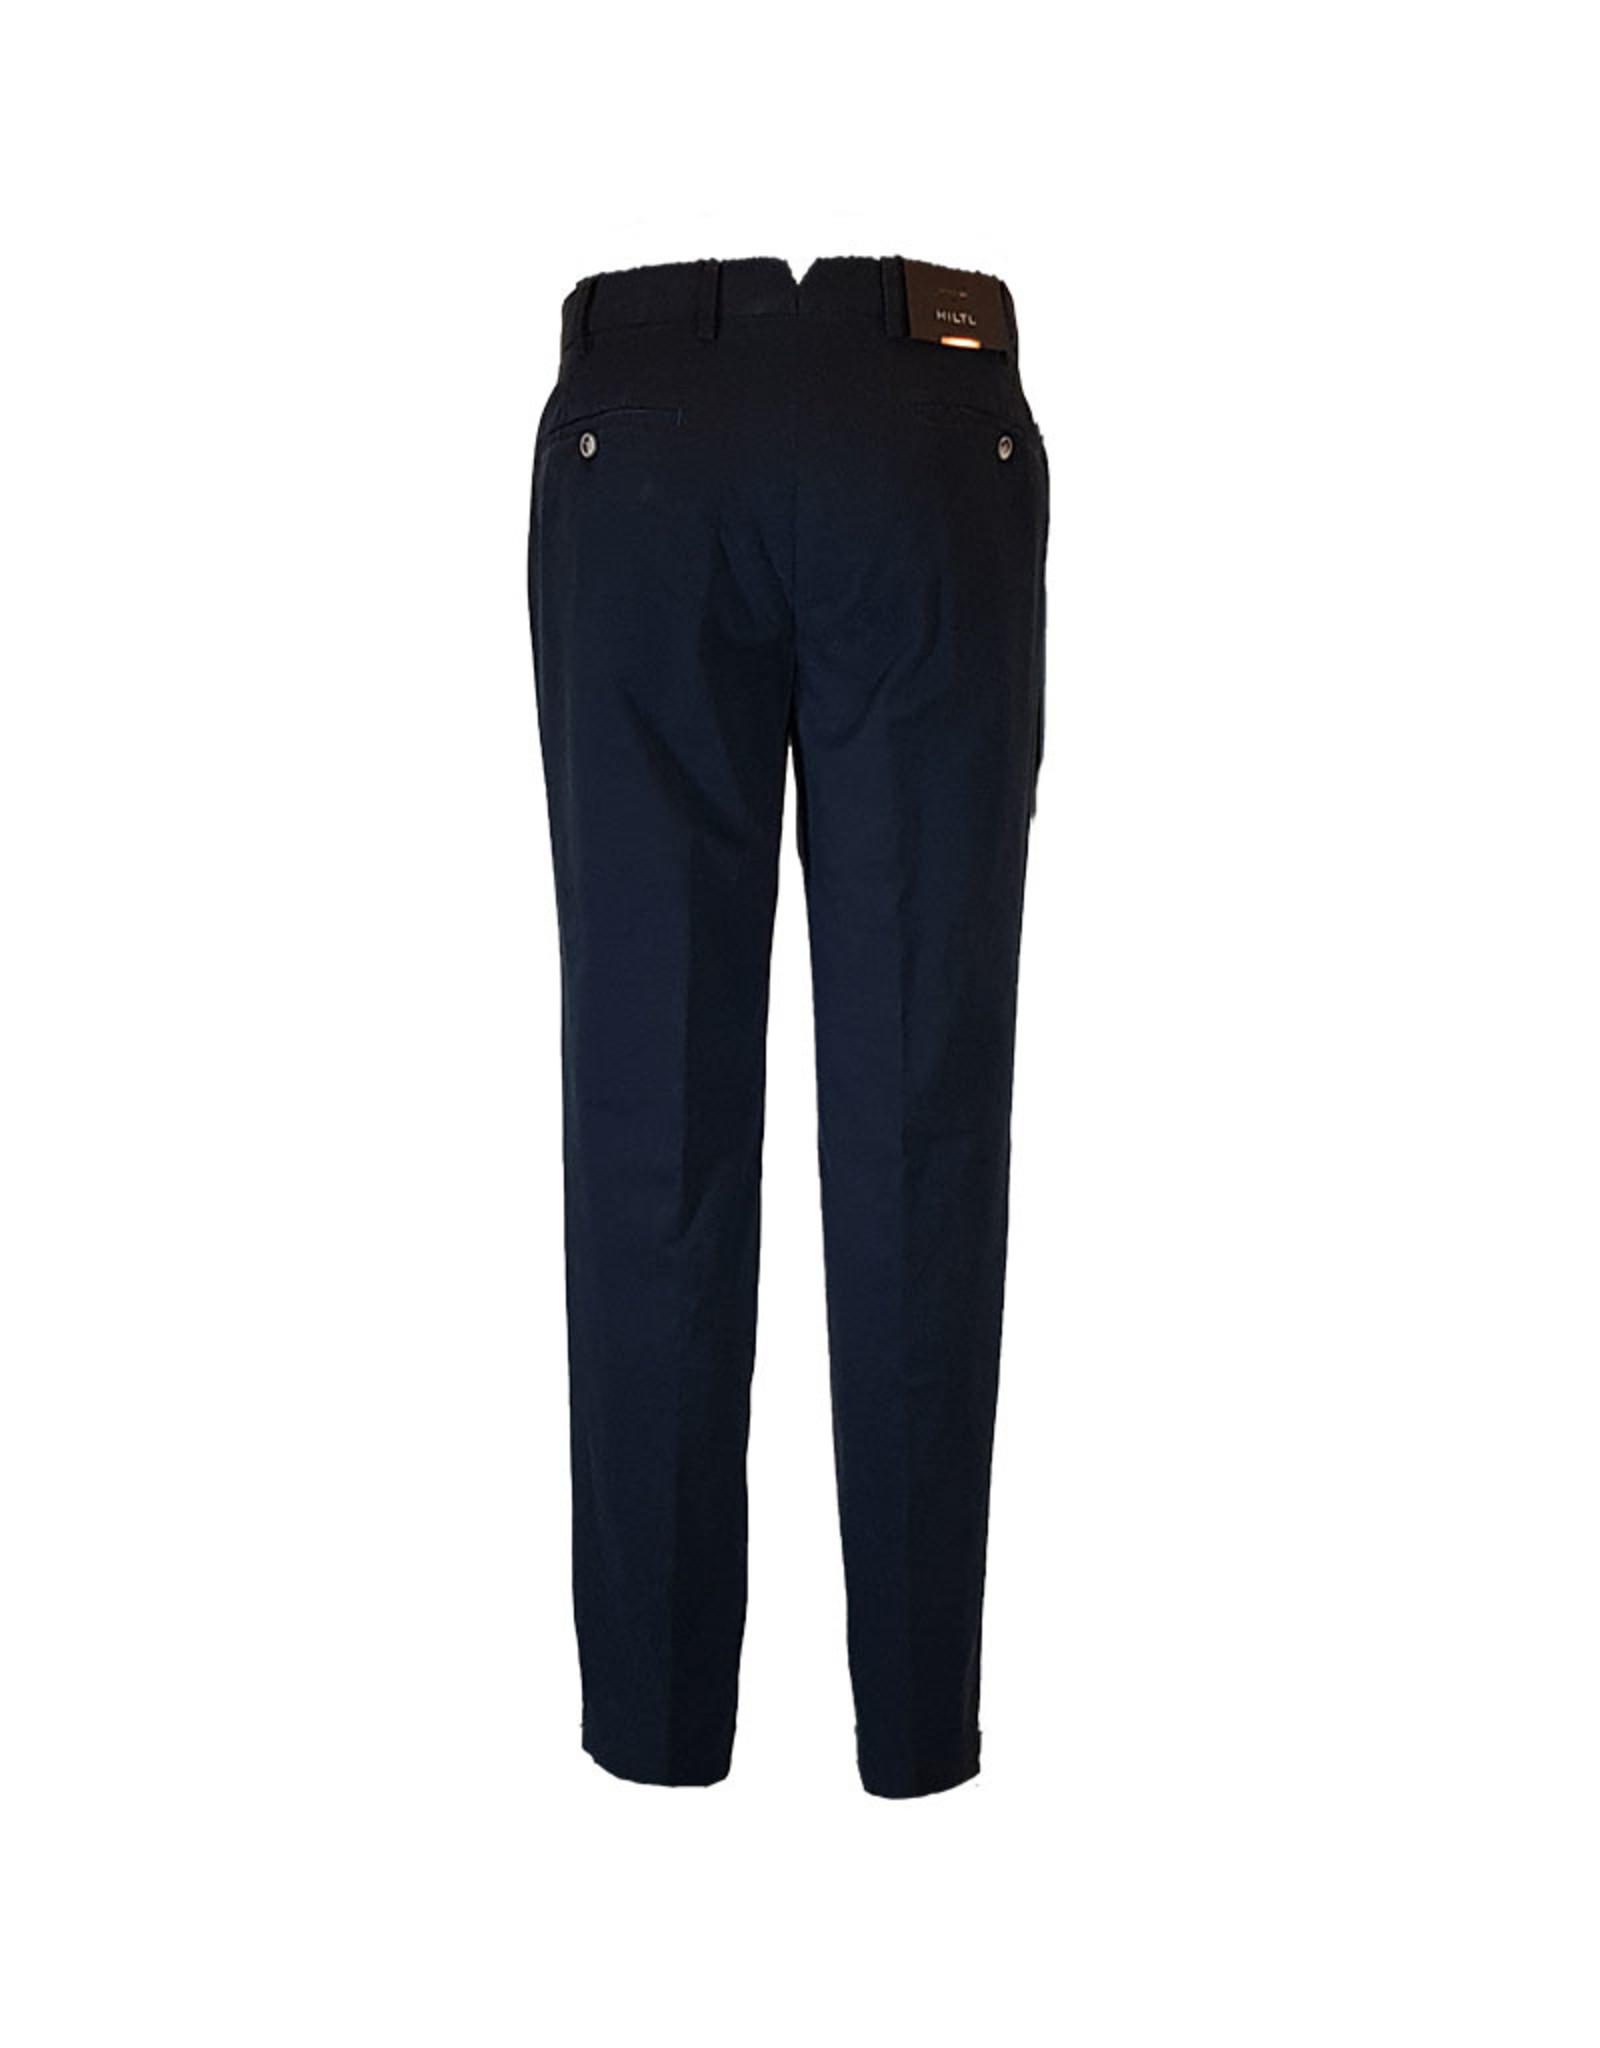 Hiltl Hiltl broek katoen blauw Palermo 75882/40